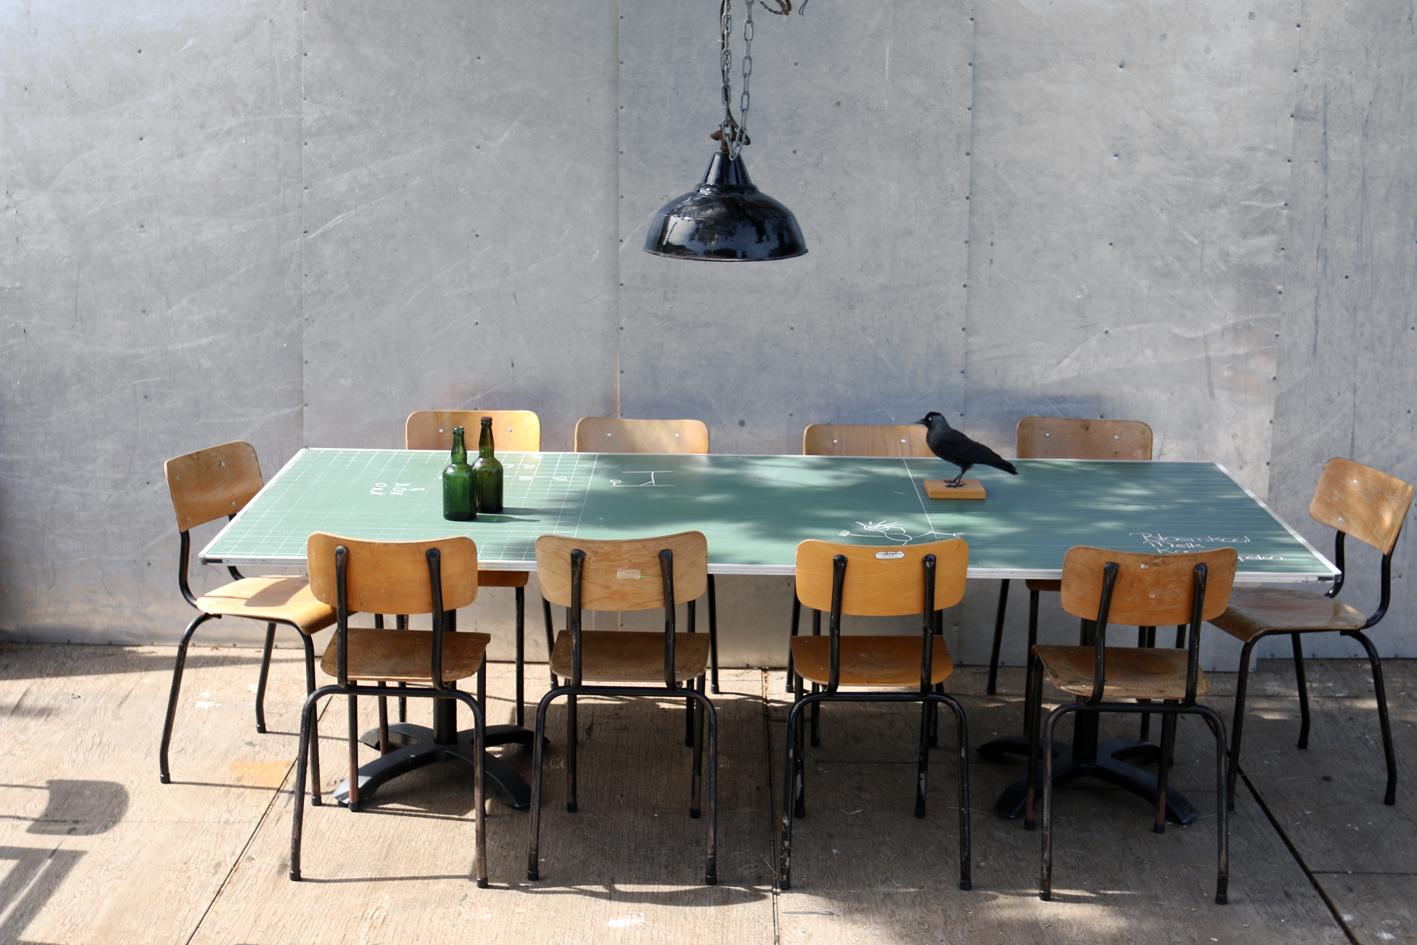 Uniek industrieel vintage retro schoolbord tafel 2 5 x1 2 for Retro tafel